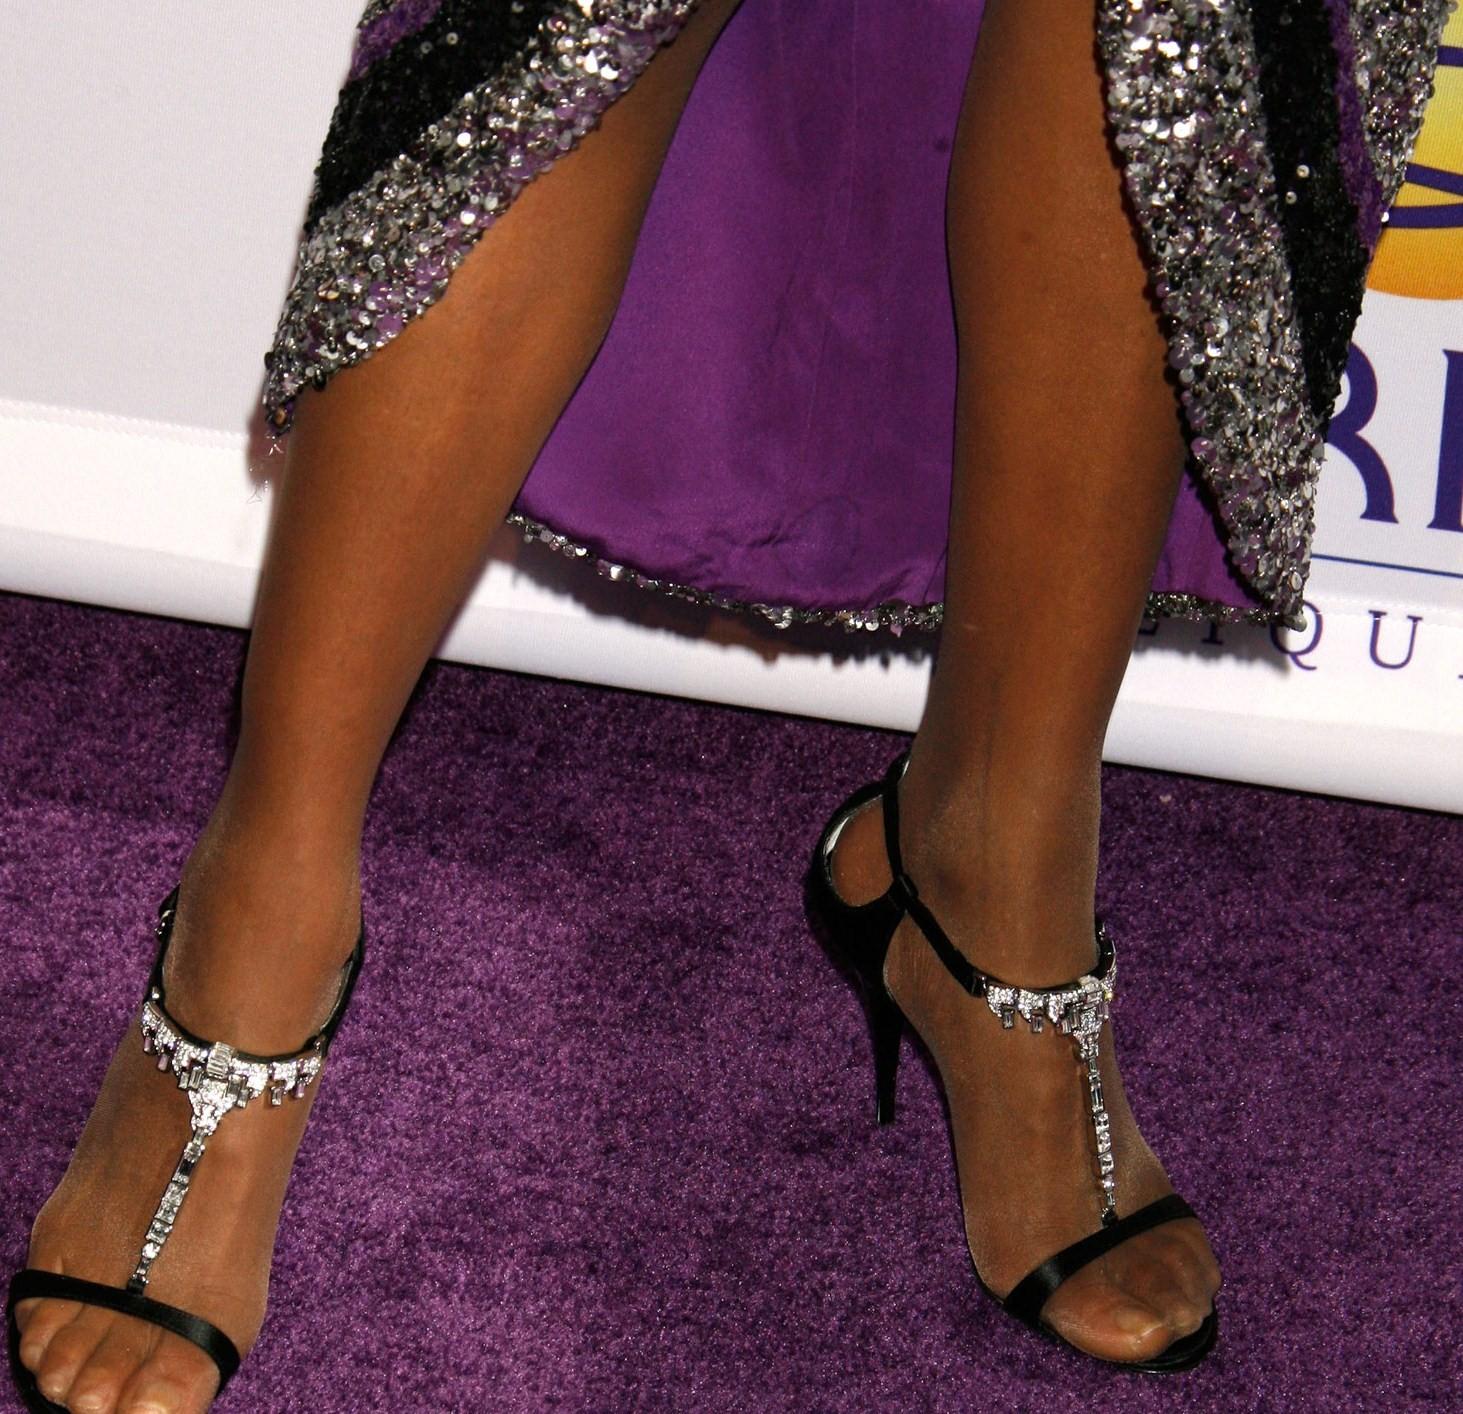 http://3.bp.blogspot.com/_UaLWp72nij4/THLfVZ1lr3I/AAAAAAAAT6o/pZUh3AhLVdA/s1600/whitney-houston-feet-3.jpg